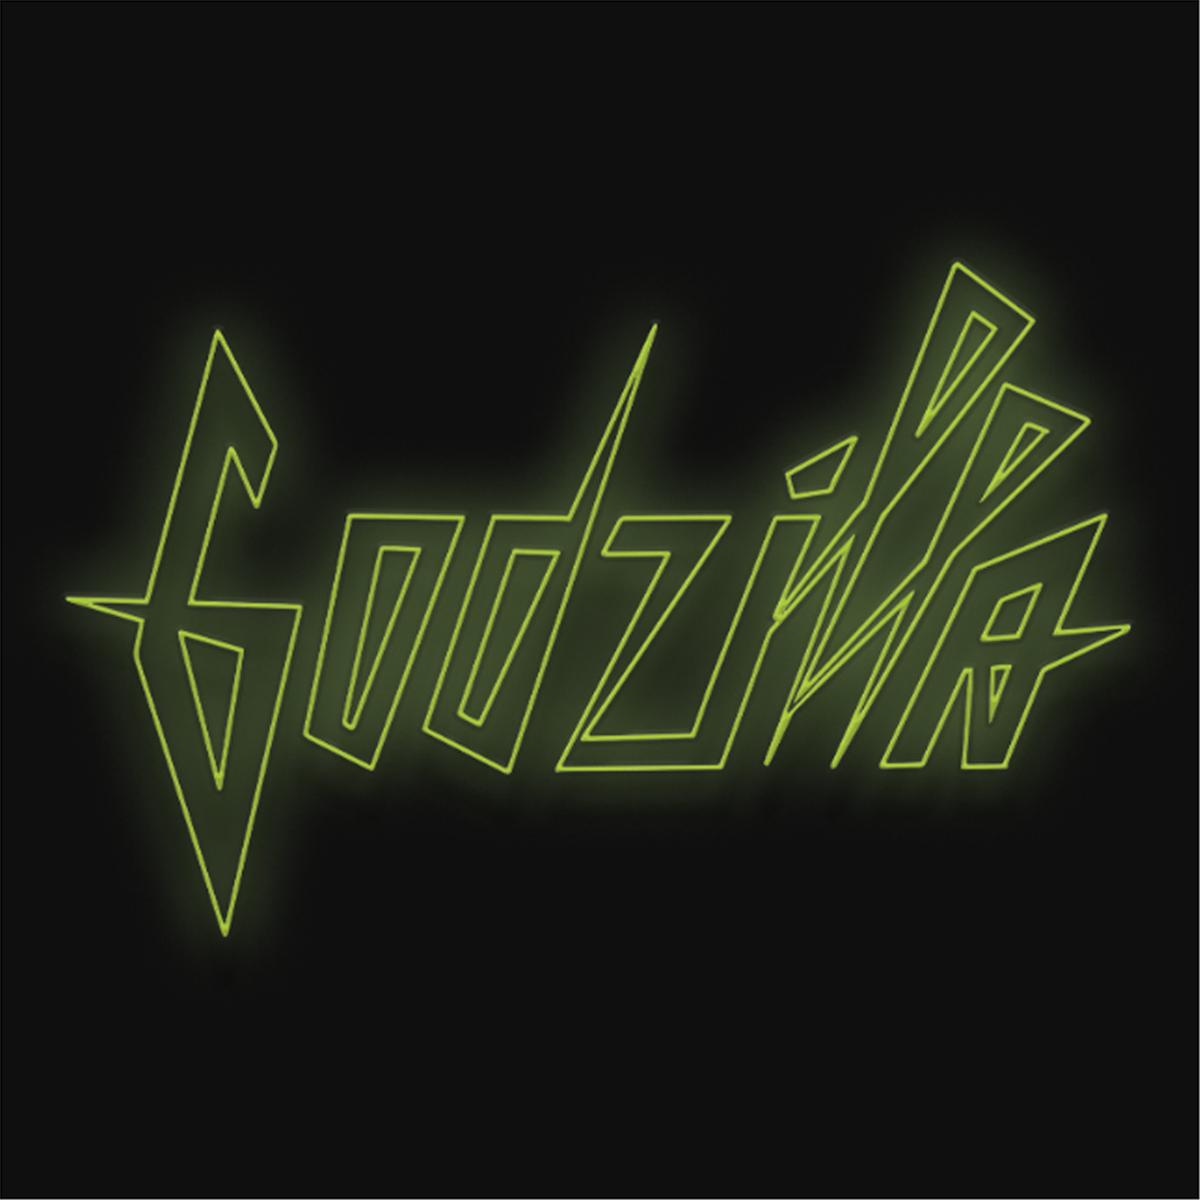 The Veronicas Godzilla album cover art